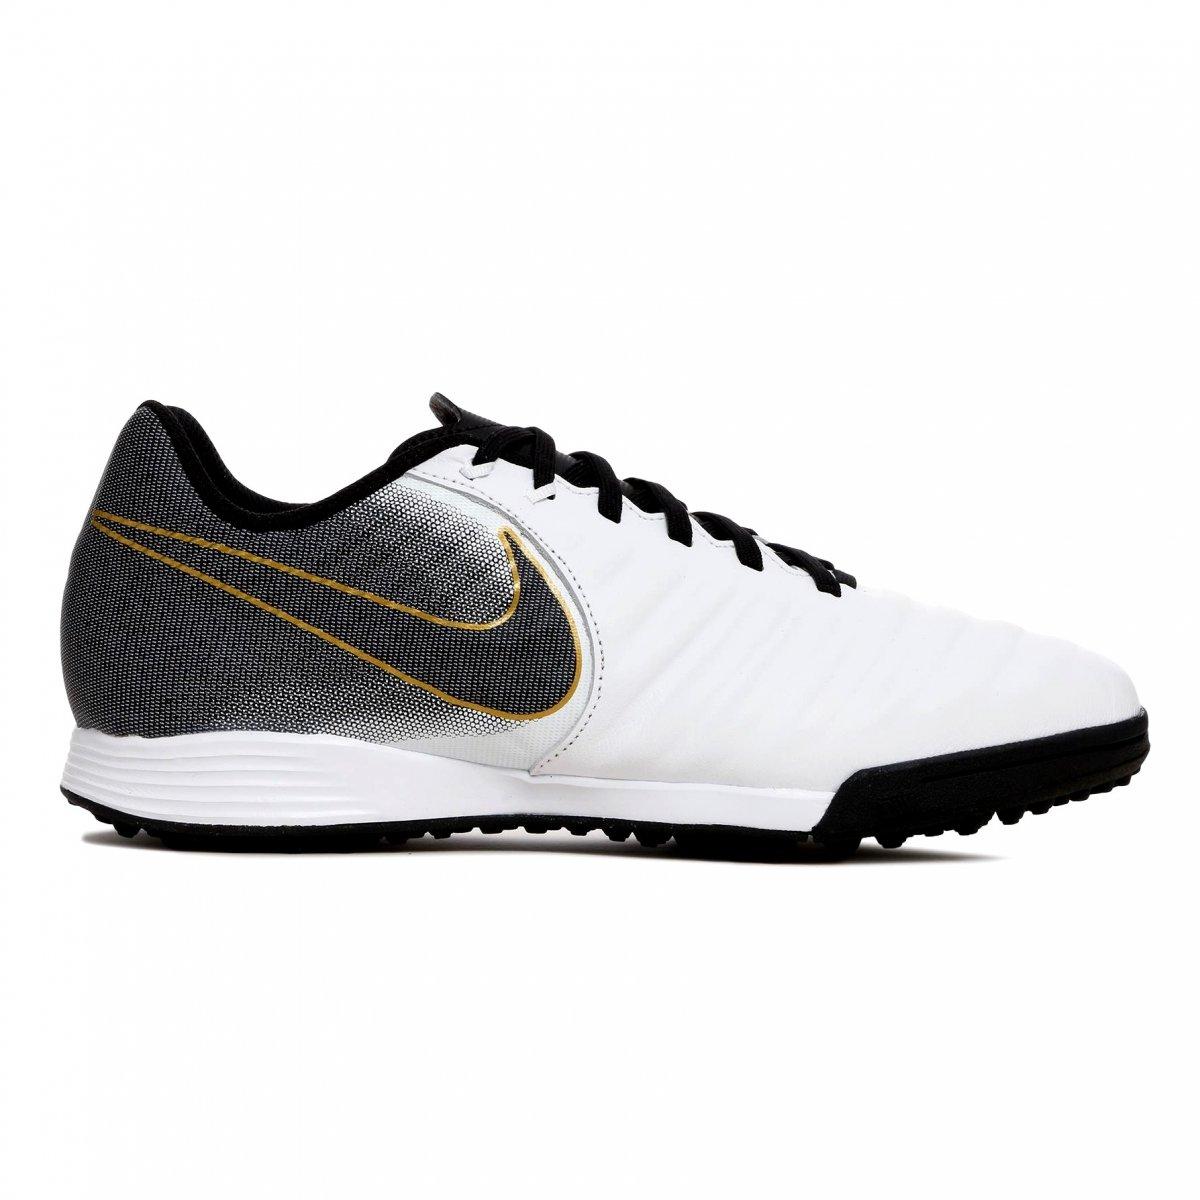 Chuteira Society Nike TiempoX Legend 7 Academy AH7243-100  Branco Preto Dourado 5947f91515971